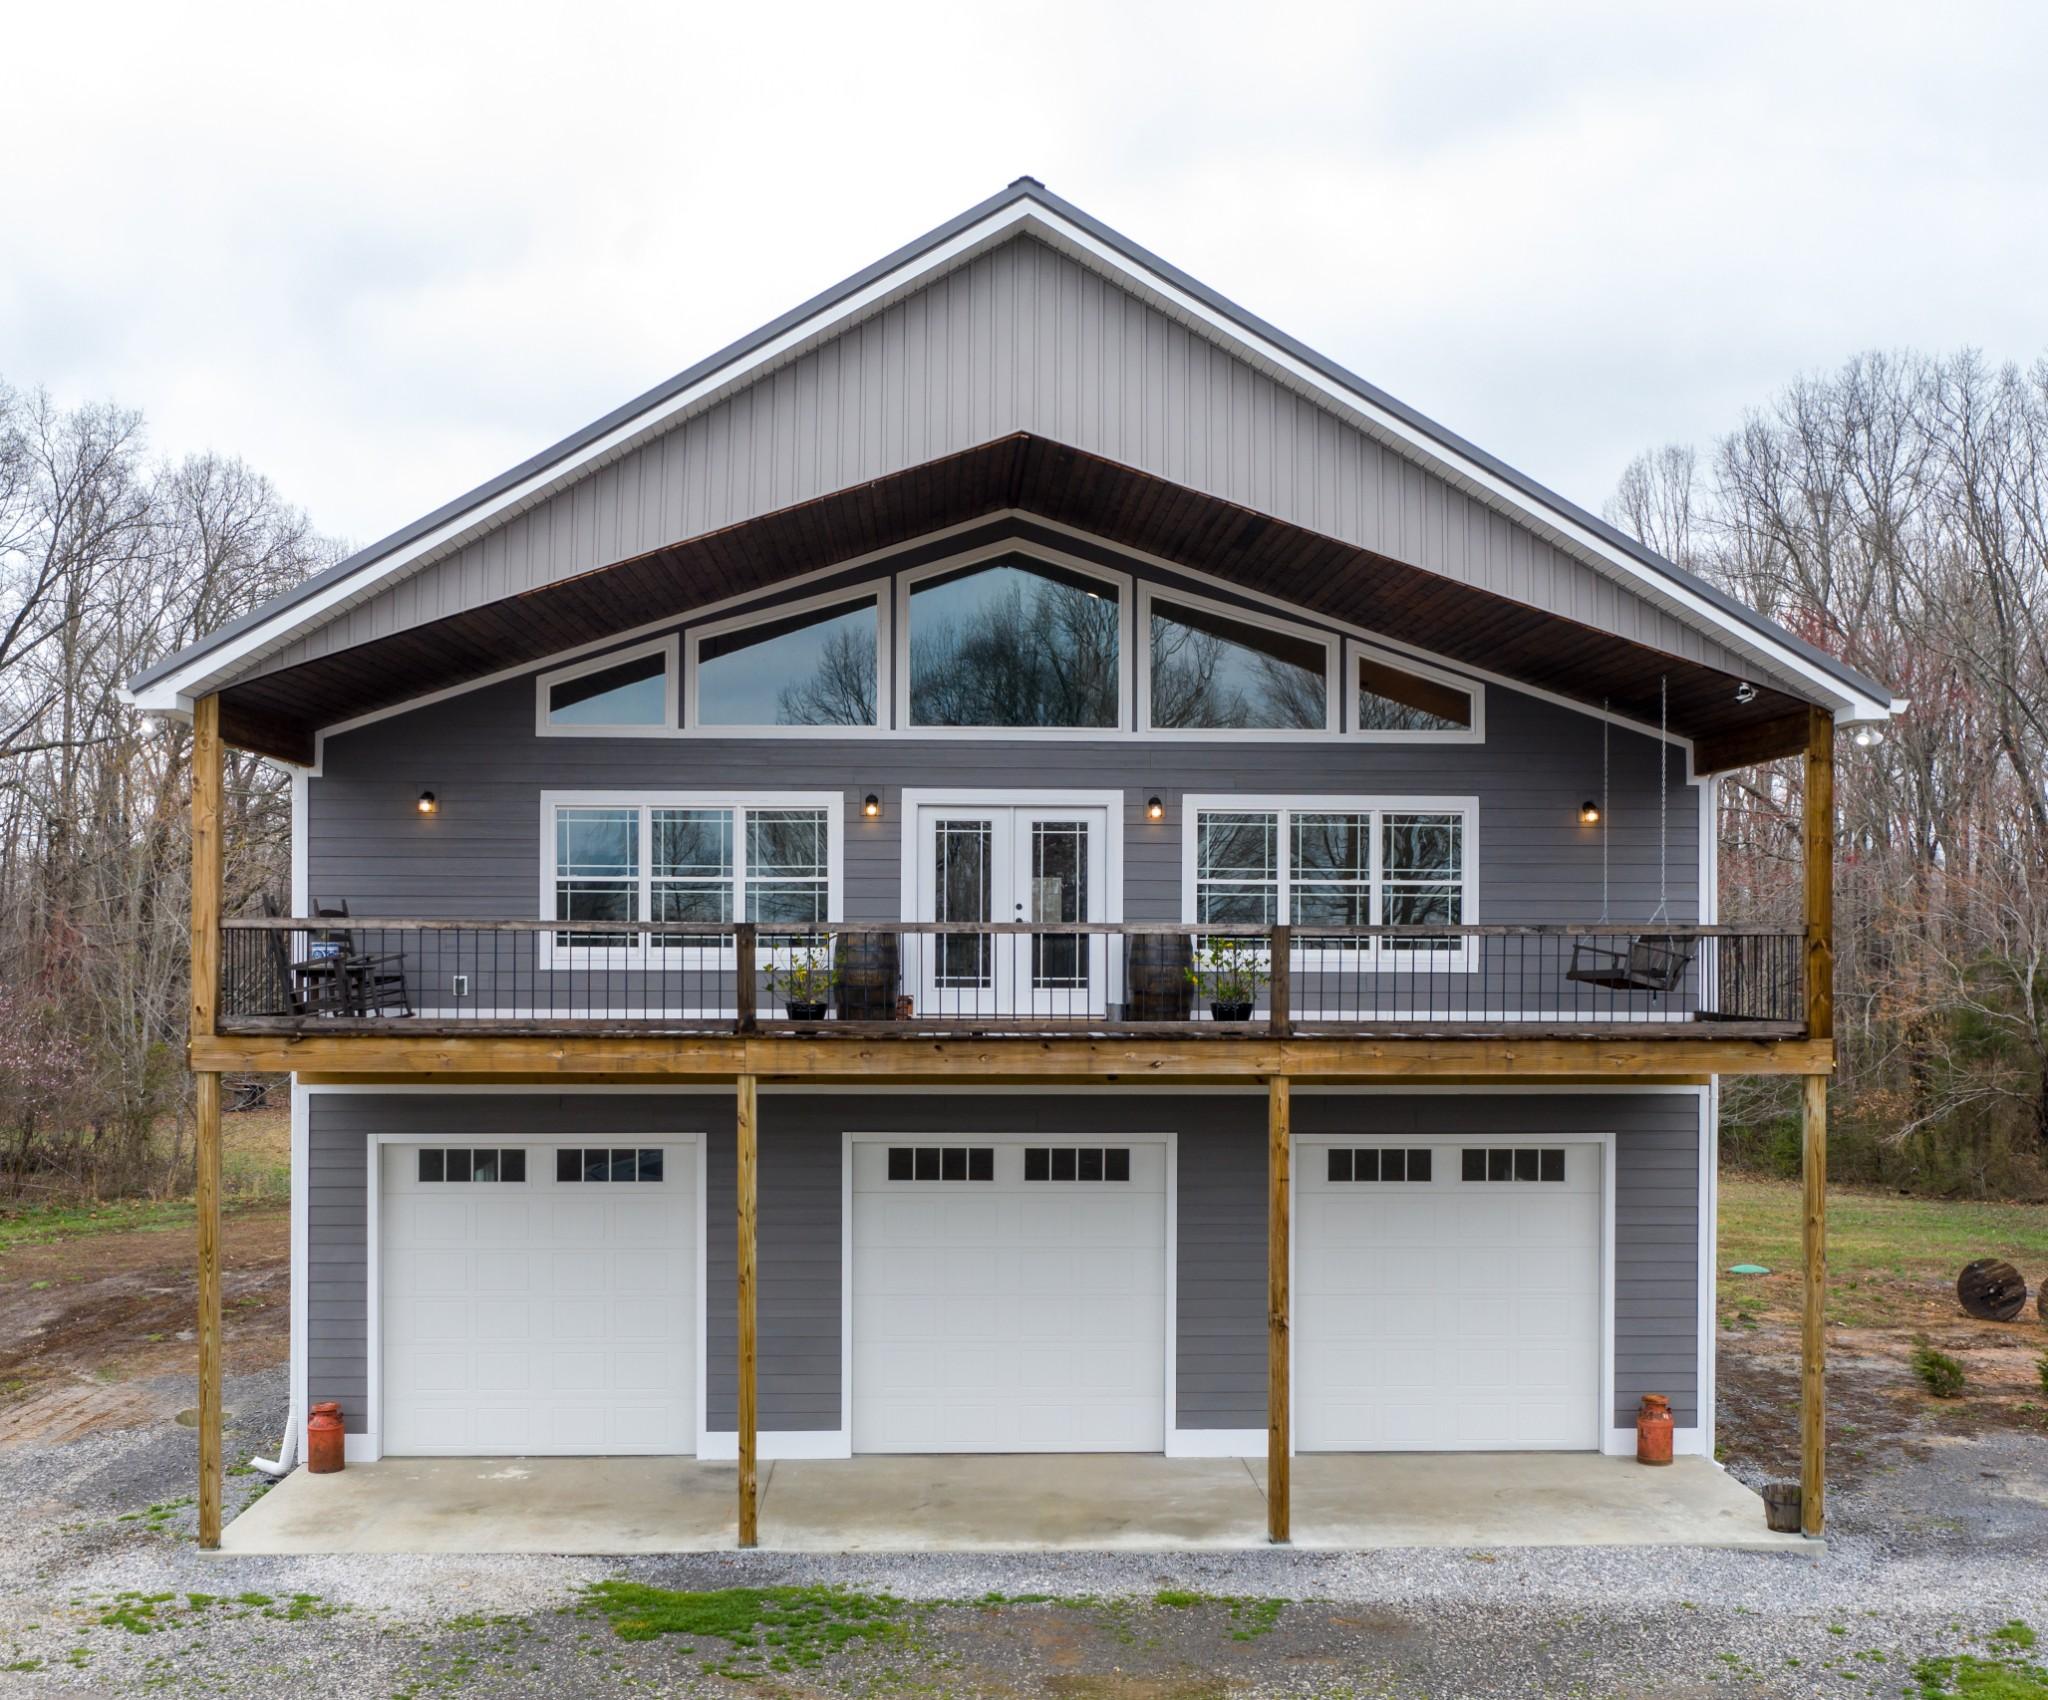 120 Coker Rd, Tullahoma, TN 37388 - Tullahoma, TN real estate listing